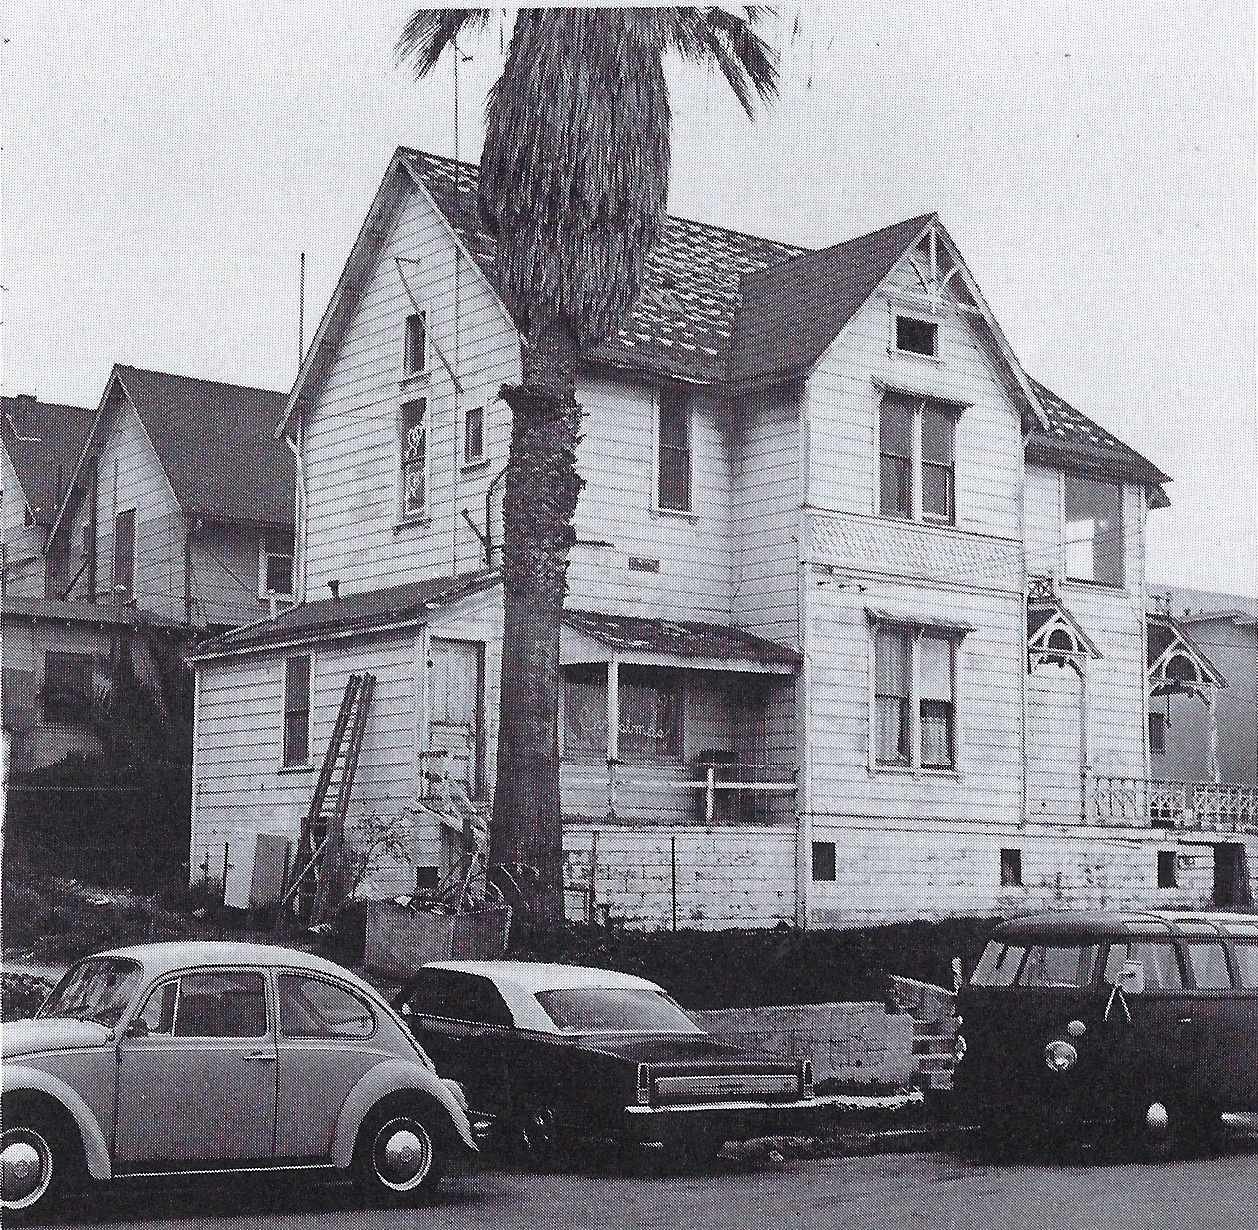 Prior to renovation, circa 1974